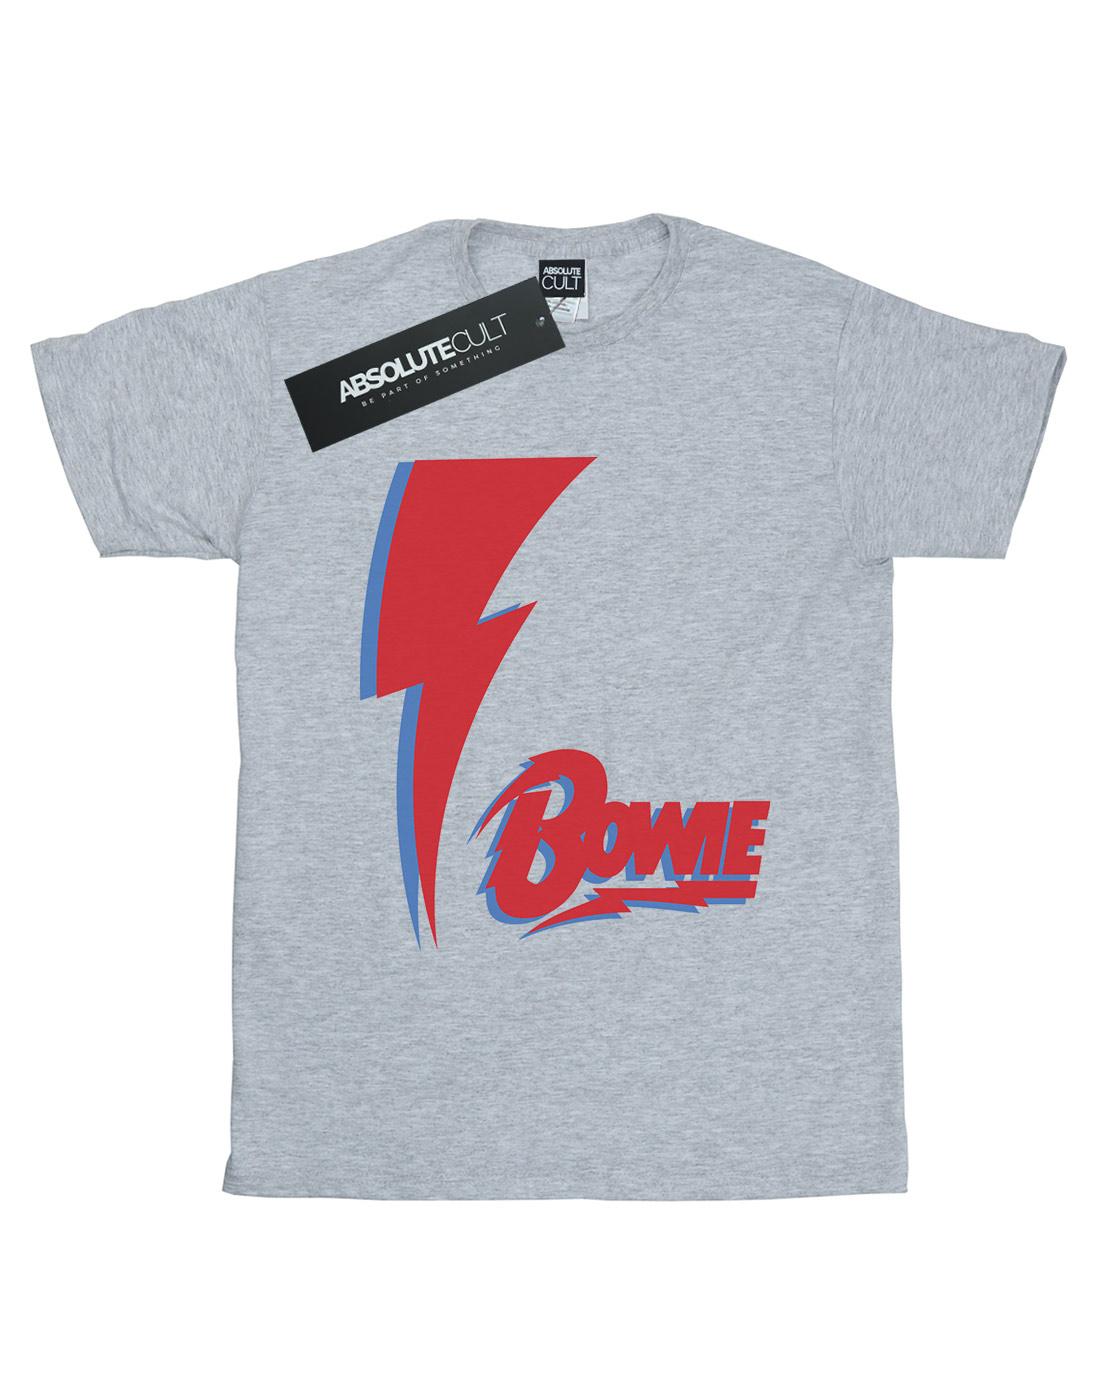 David Bowie Women/'s Red Bolt Boyfriend Fit T-Shirt